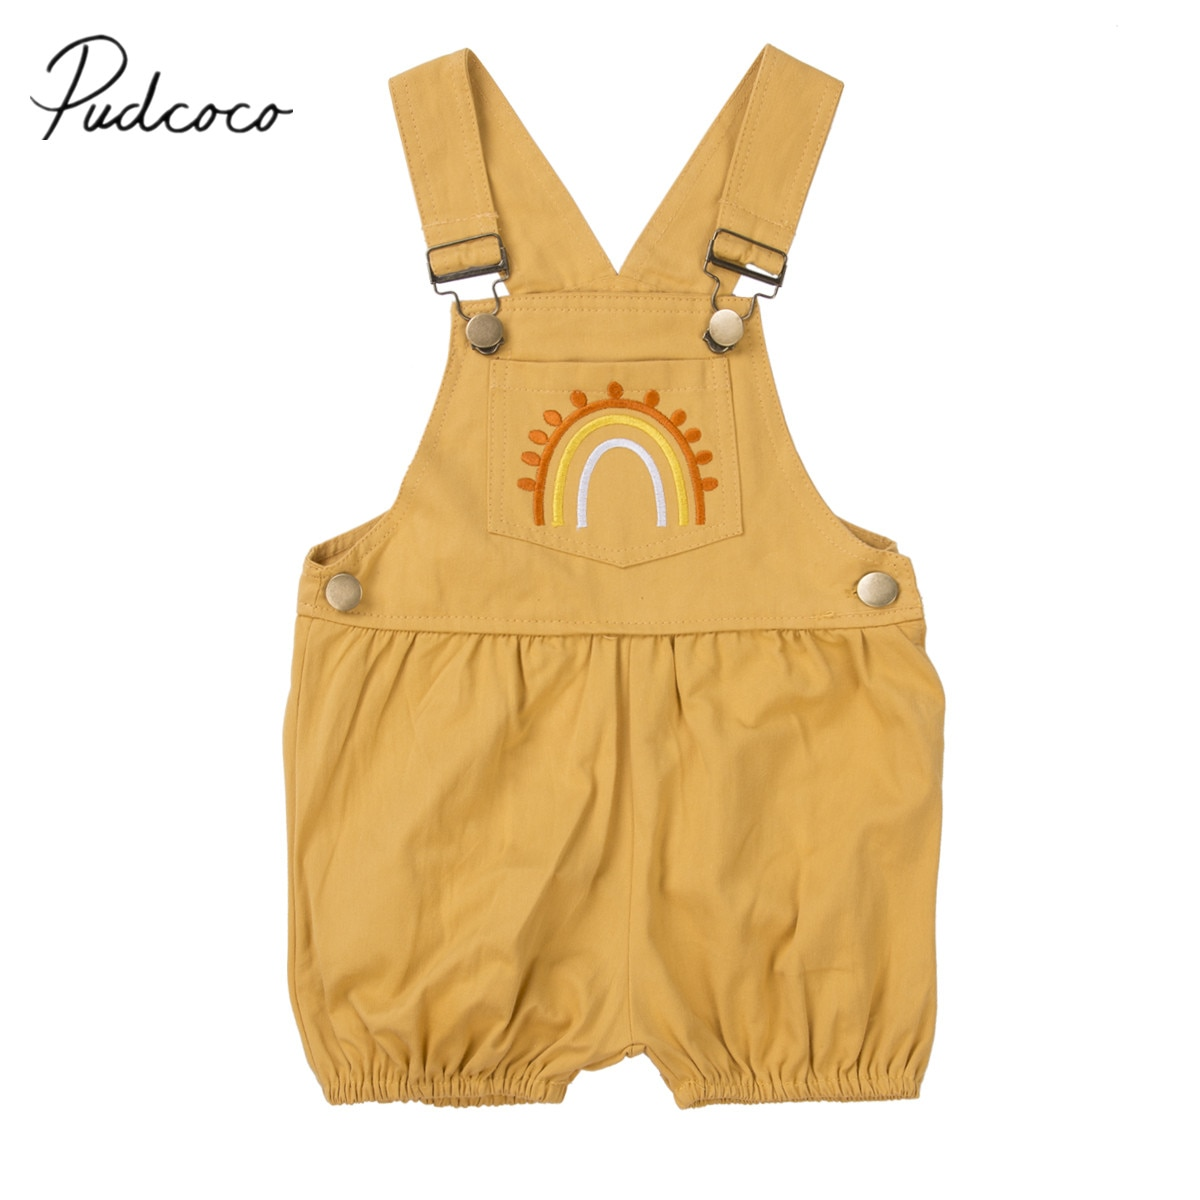 2020 ropa de verano para bebé lindo para niño, Chico, niña, ropa bordada, mono de arcoíris, mono, babero, conjunto, 6 M-4 T